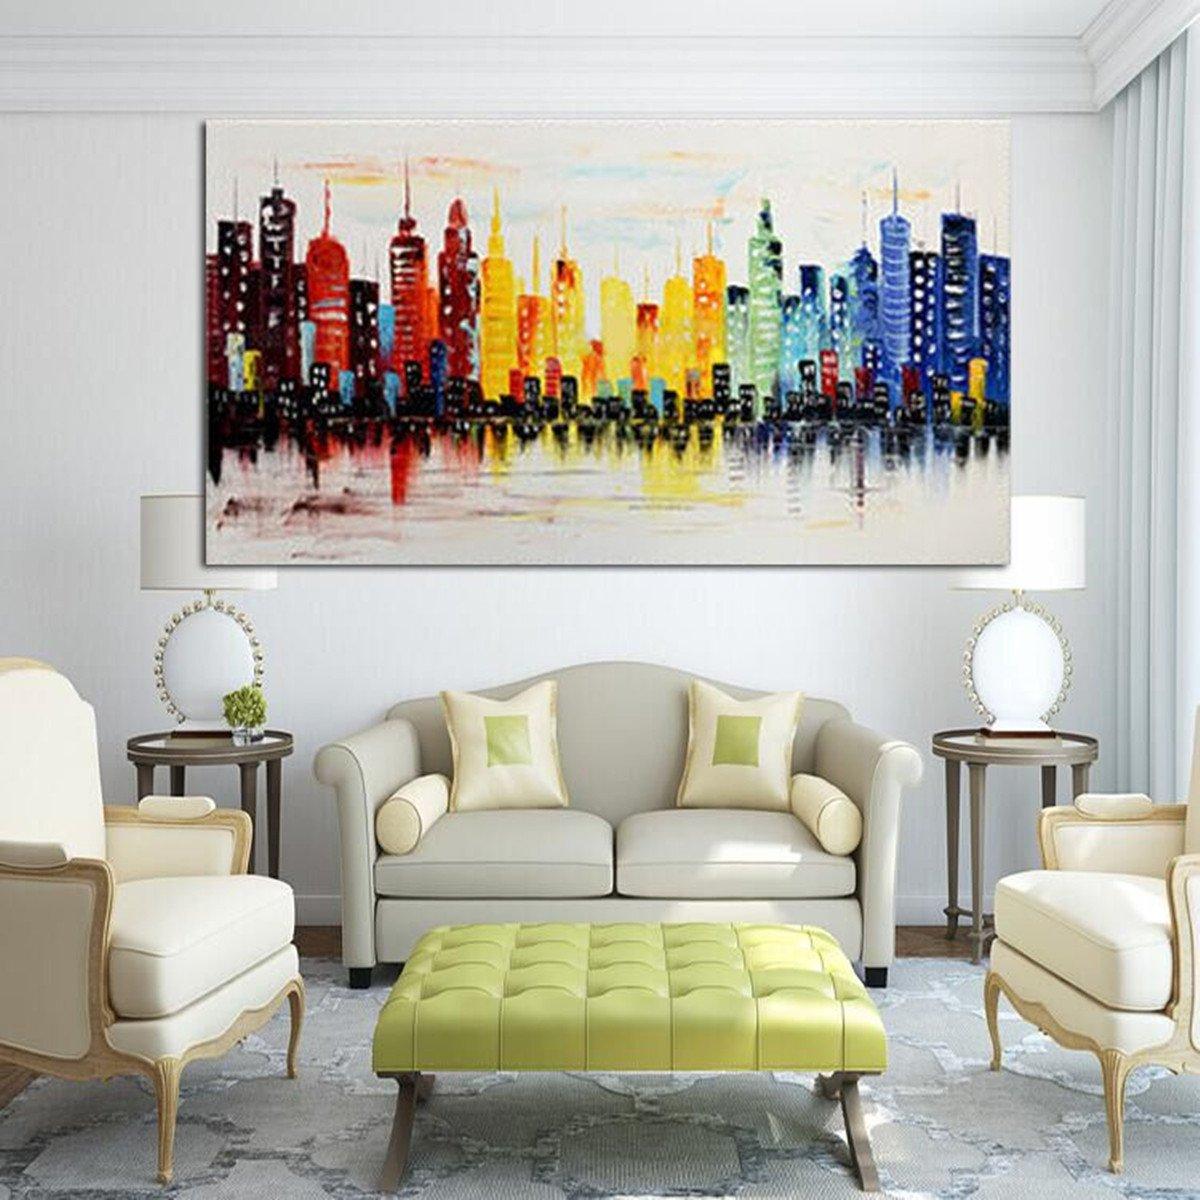 Modern Living Room Wall Decor 120x60cm Modern City Canvas Abstract Painting Print Living